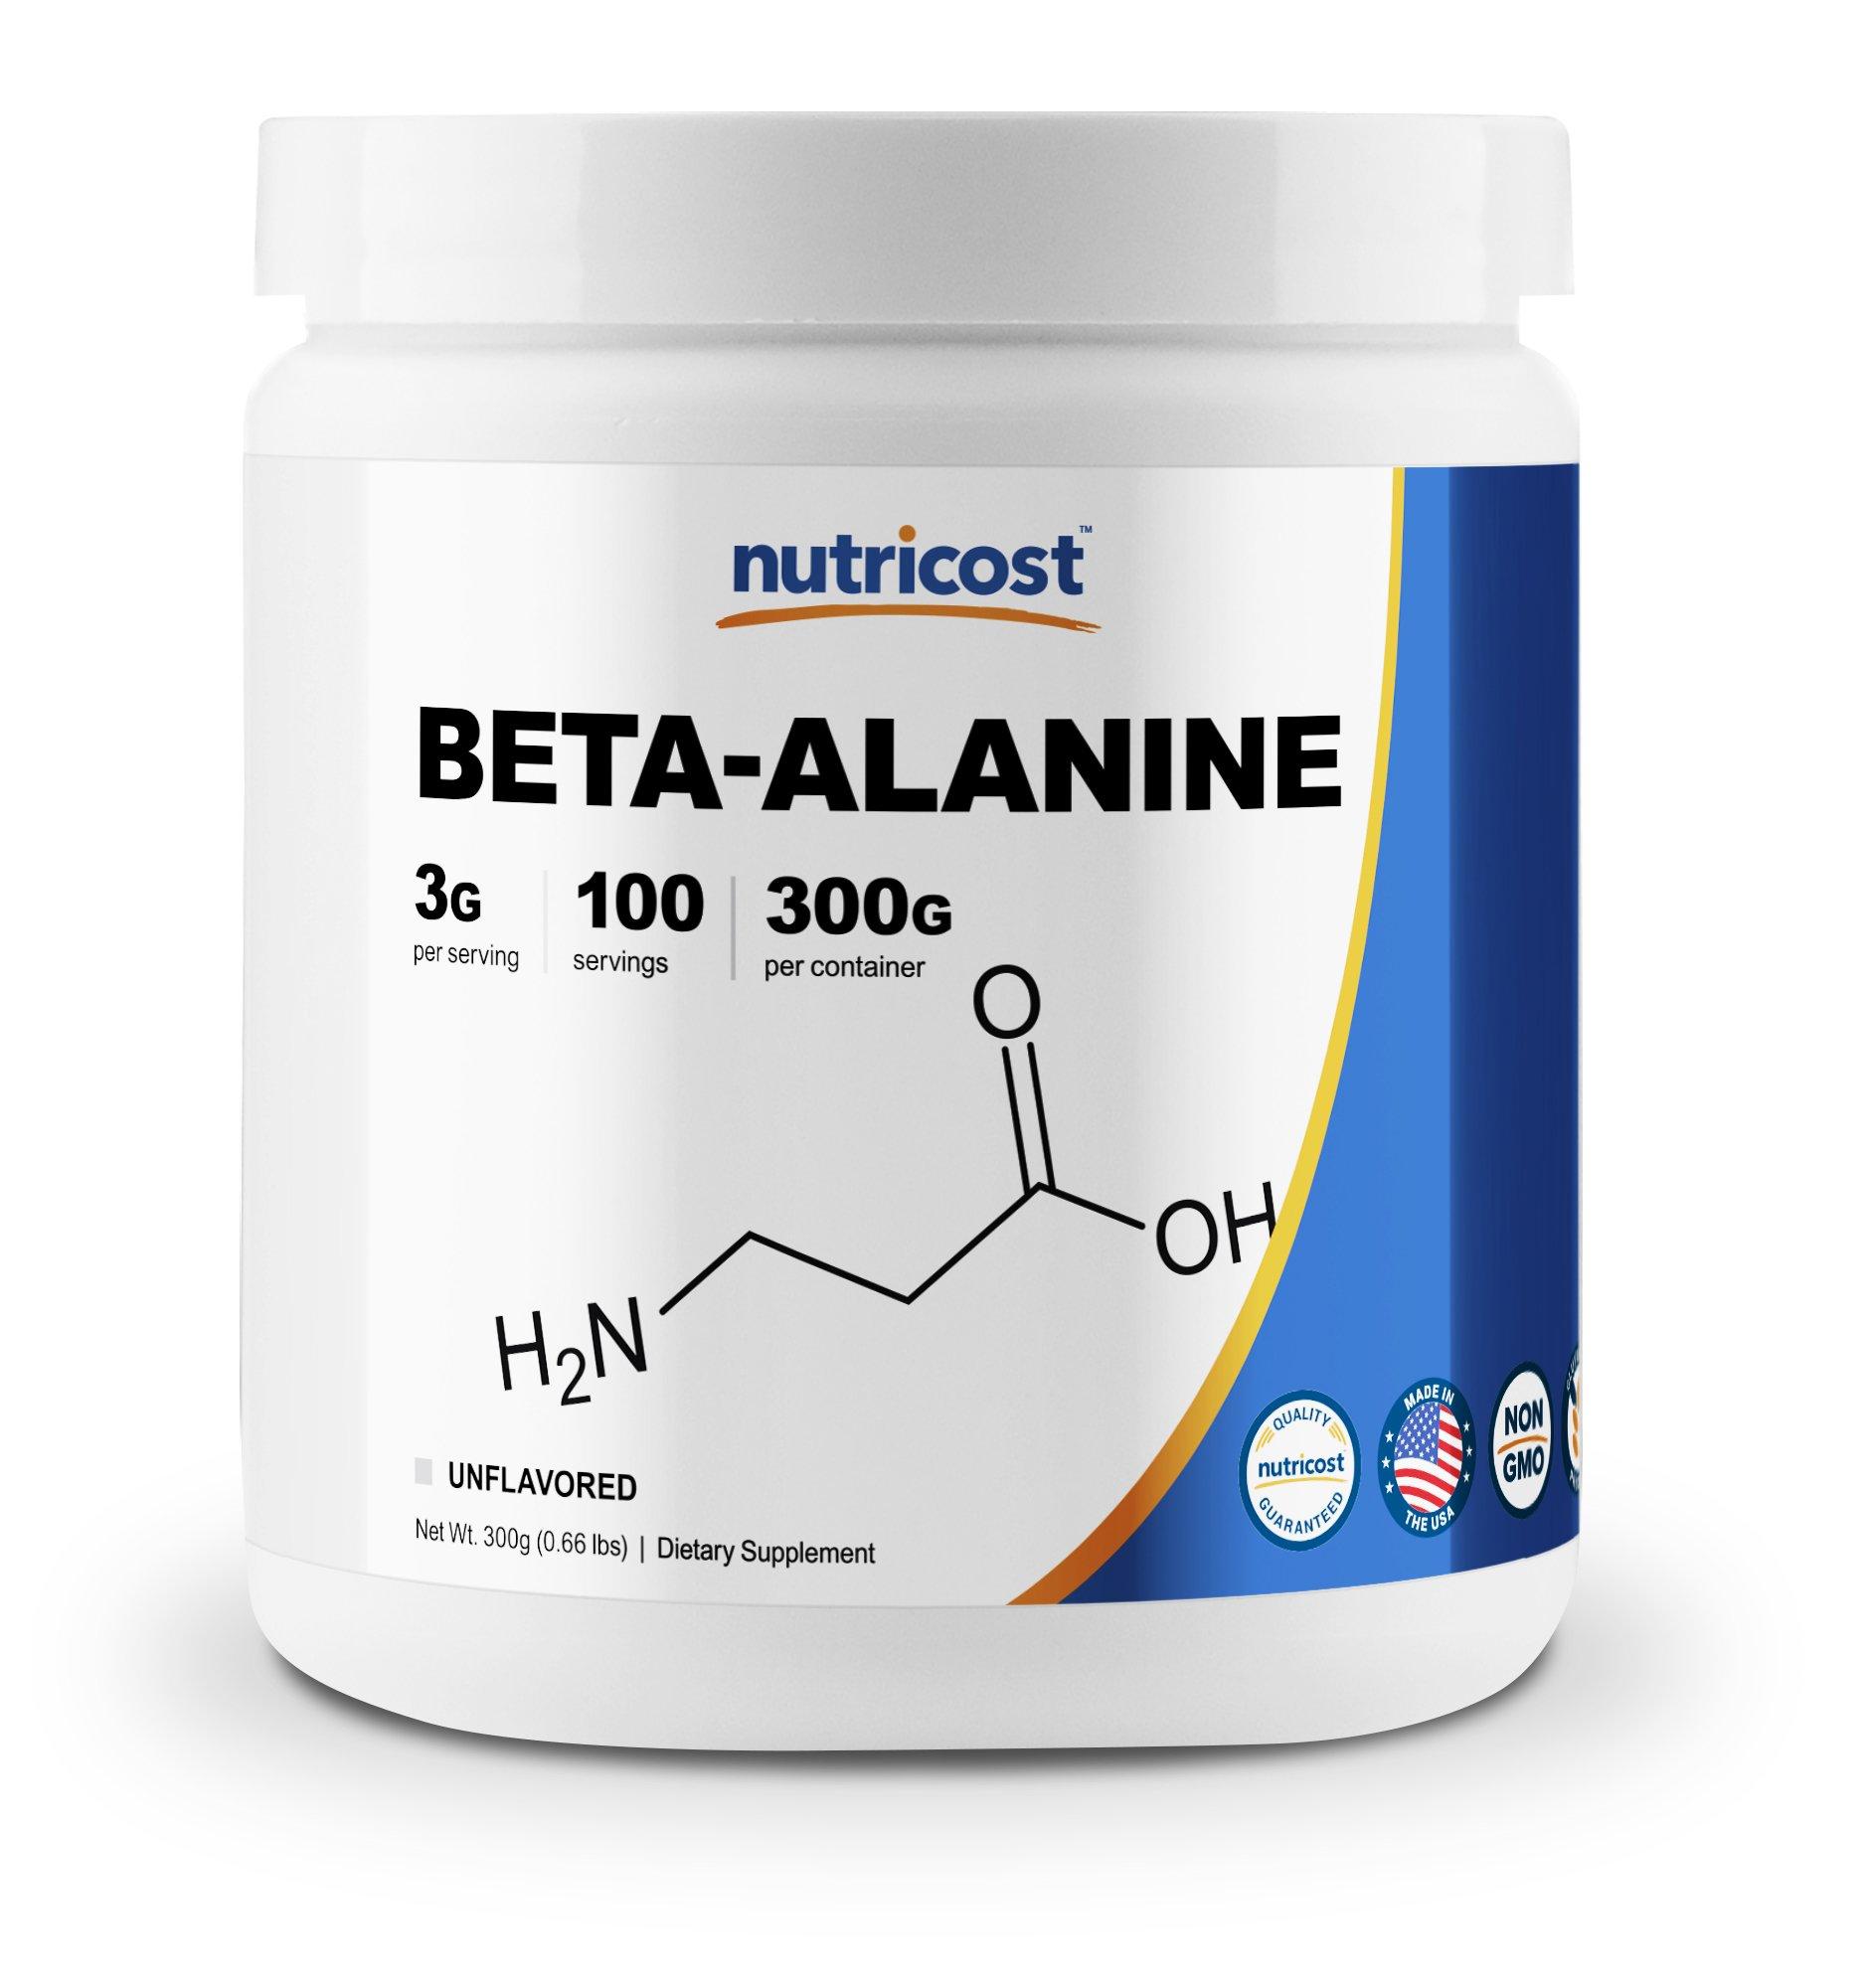 Nutricost Beta Alanine Powder 300 Grams - 3 Grams Per Serving